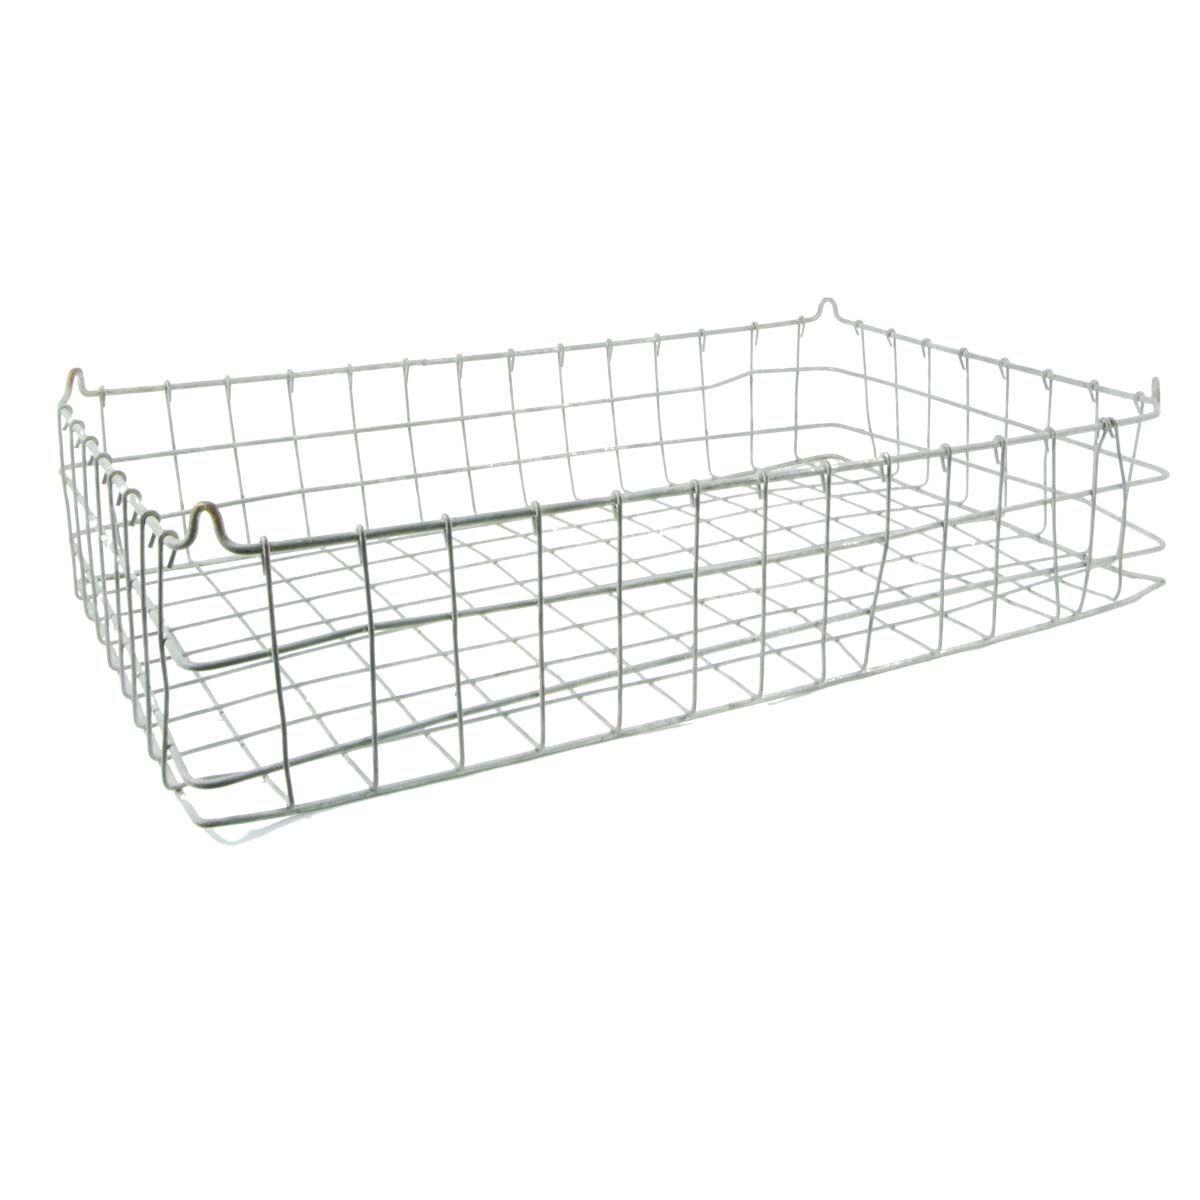 Large Galvanised Vintage Wire Basket Tray